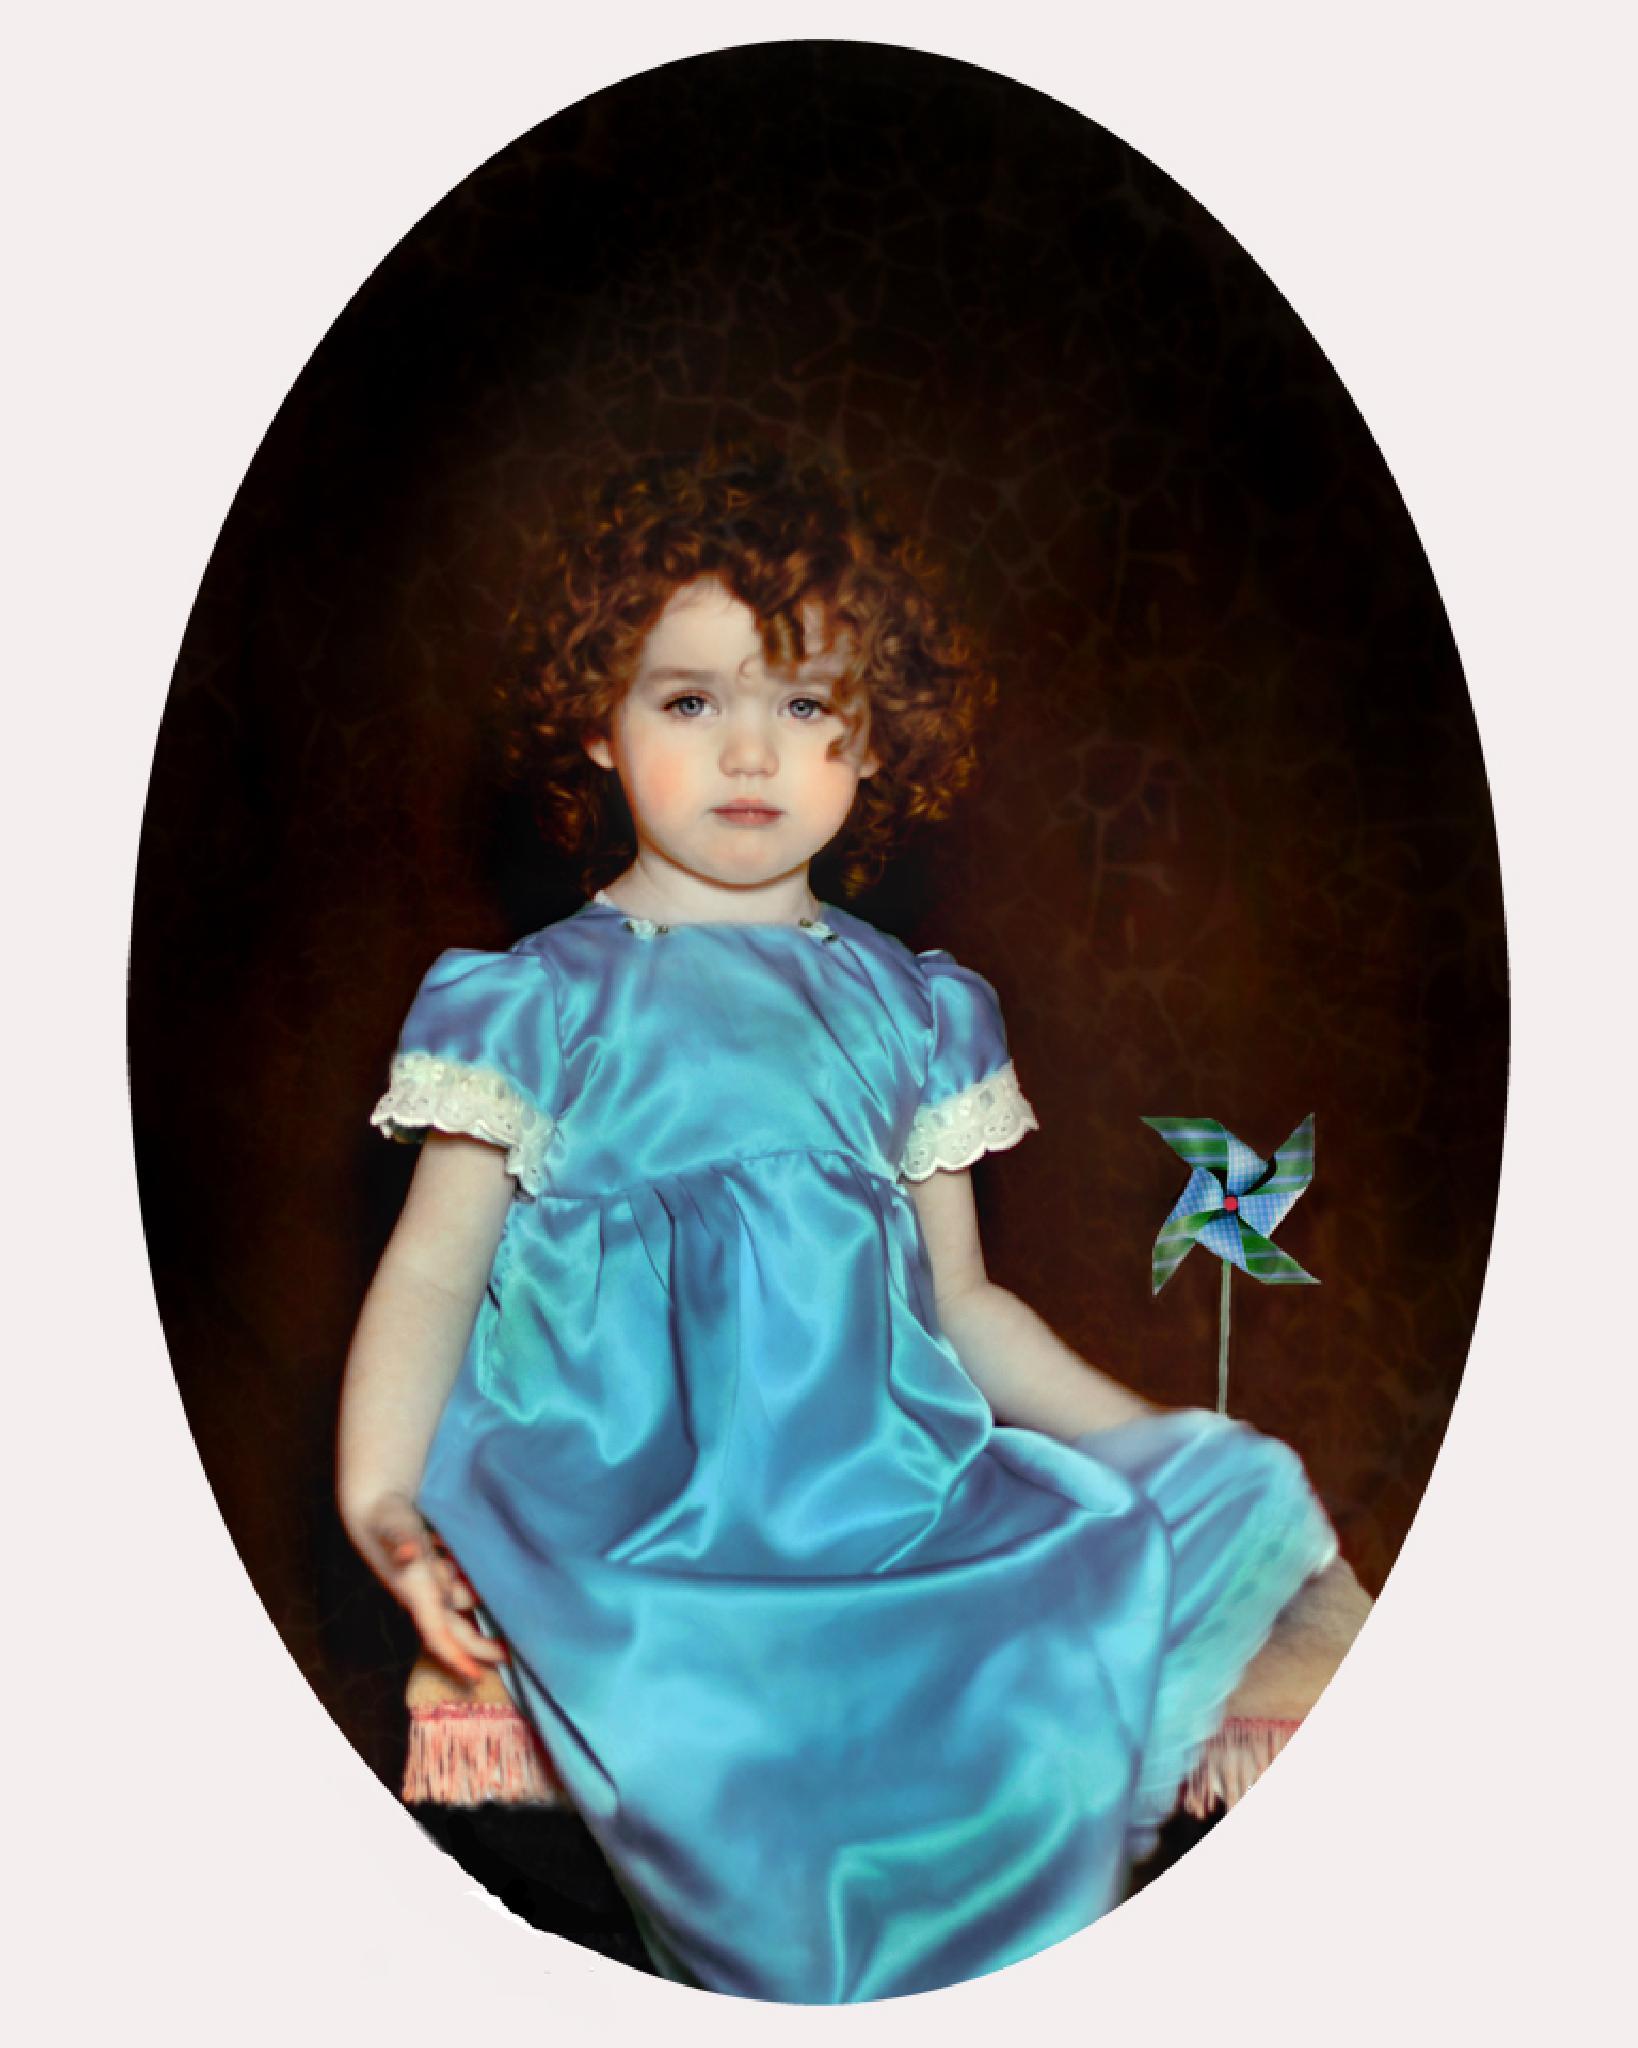 Pinwheel's & Dreams by KellyBird